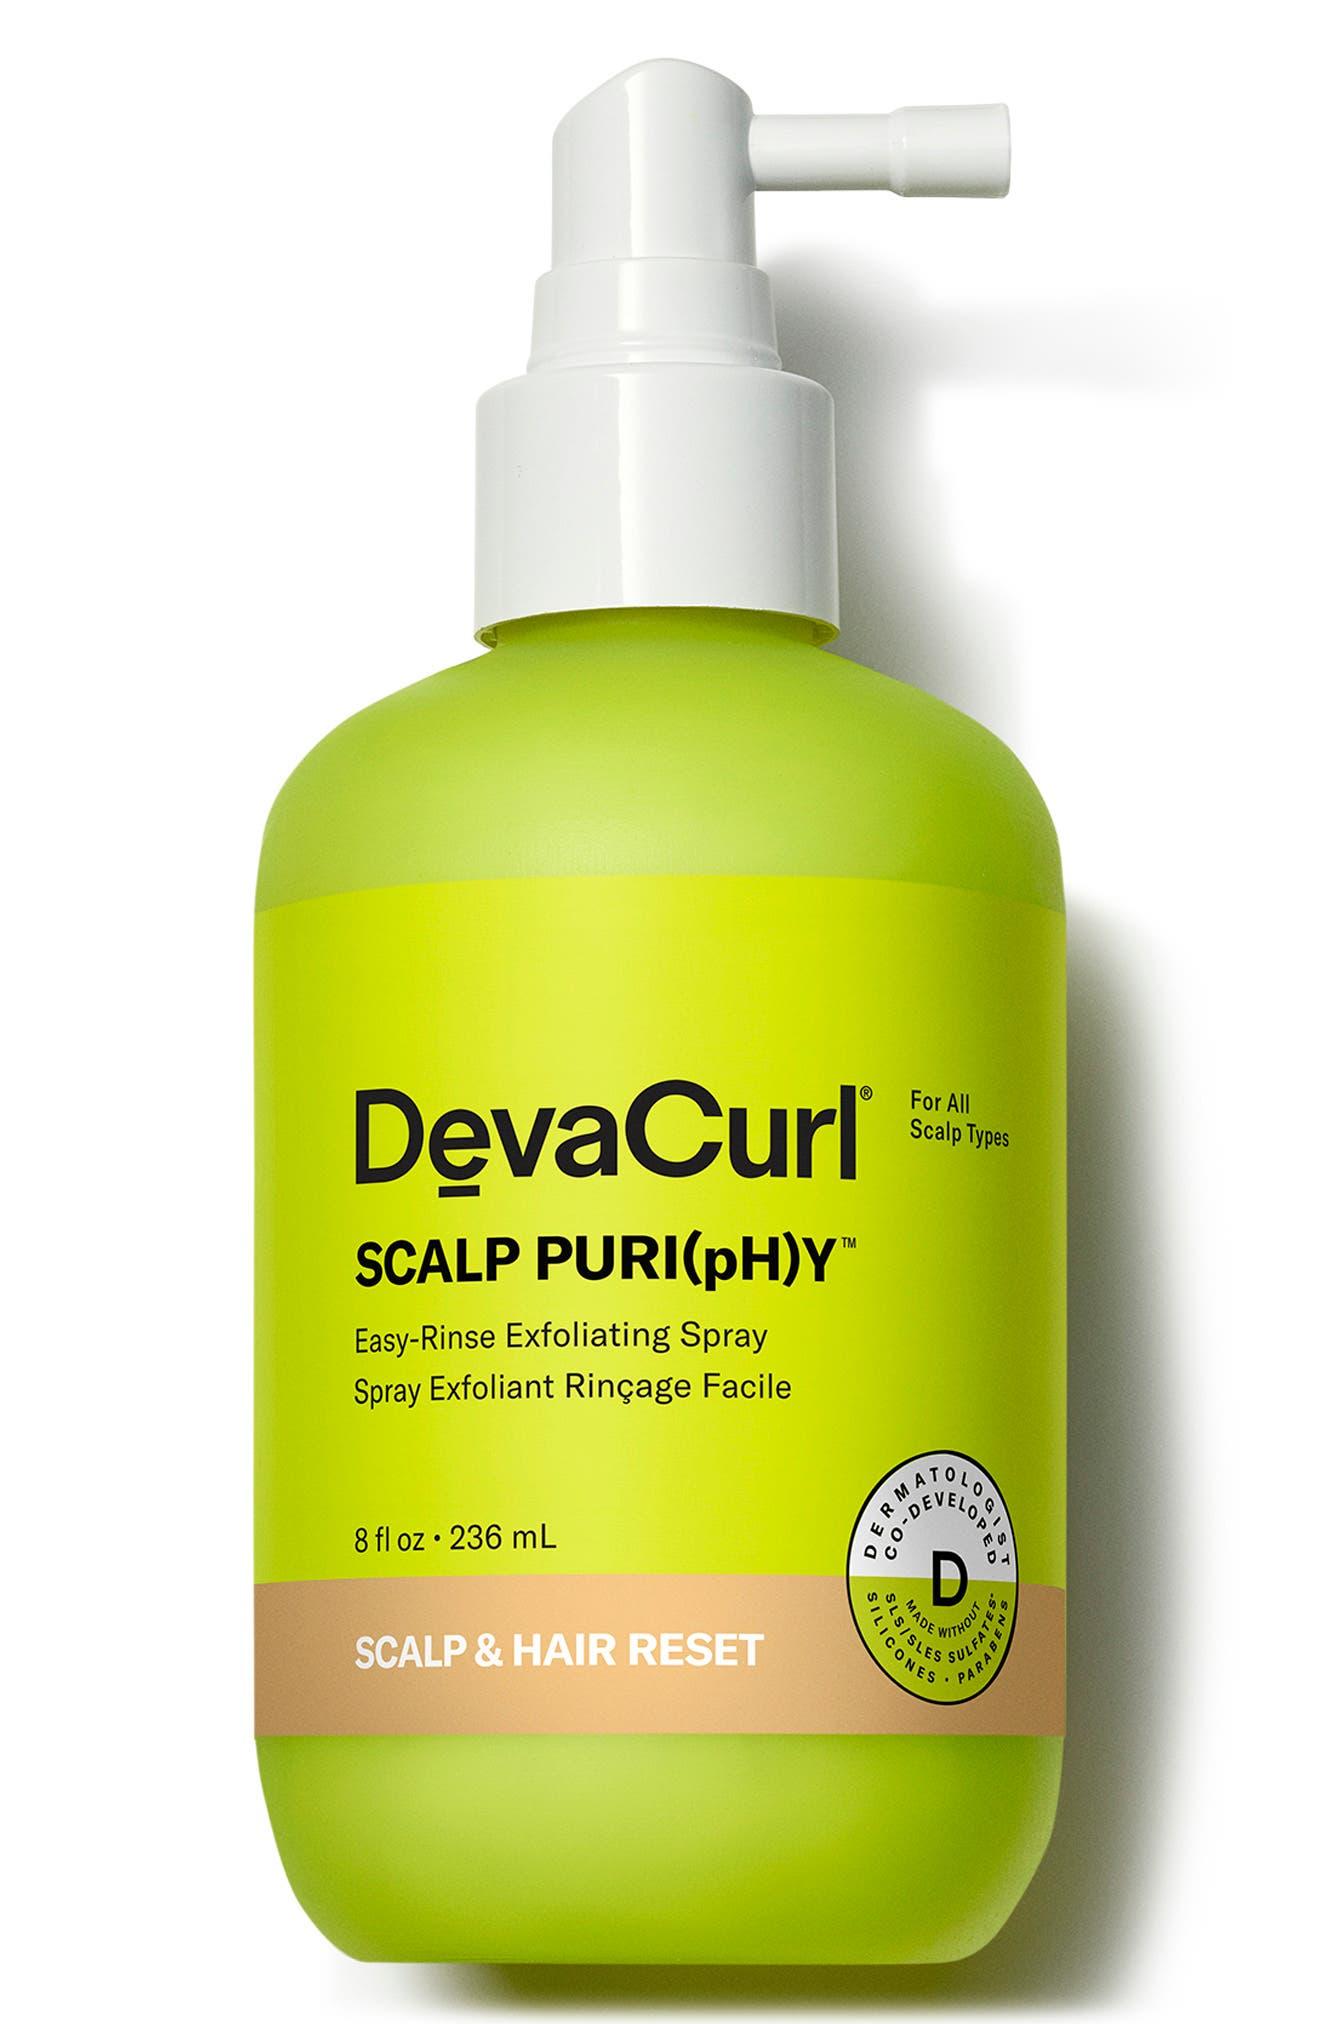 Scalp Puri(Ph)Y Easy-Rinse Exfoliating Spray